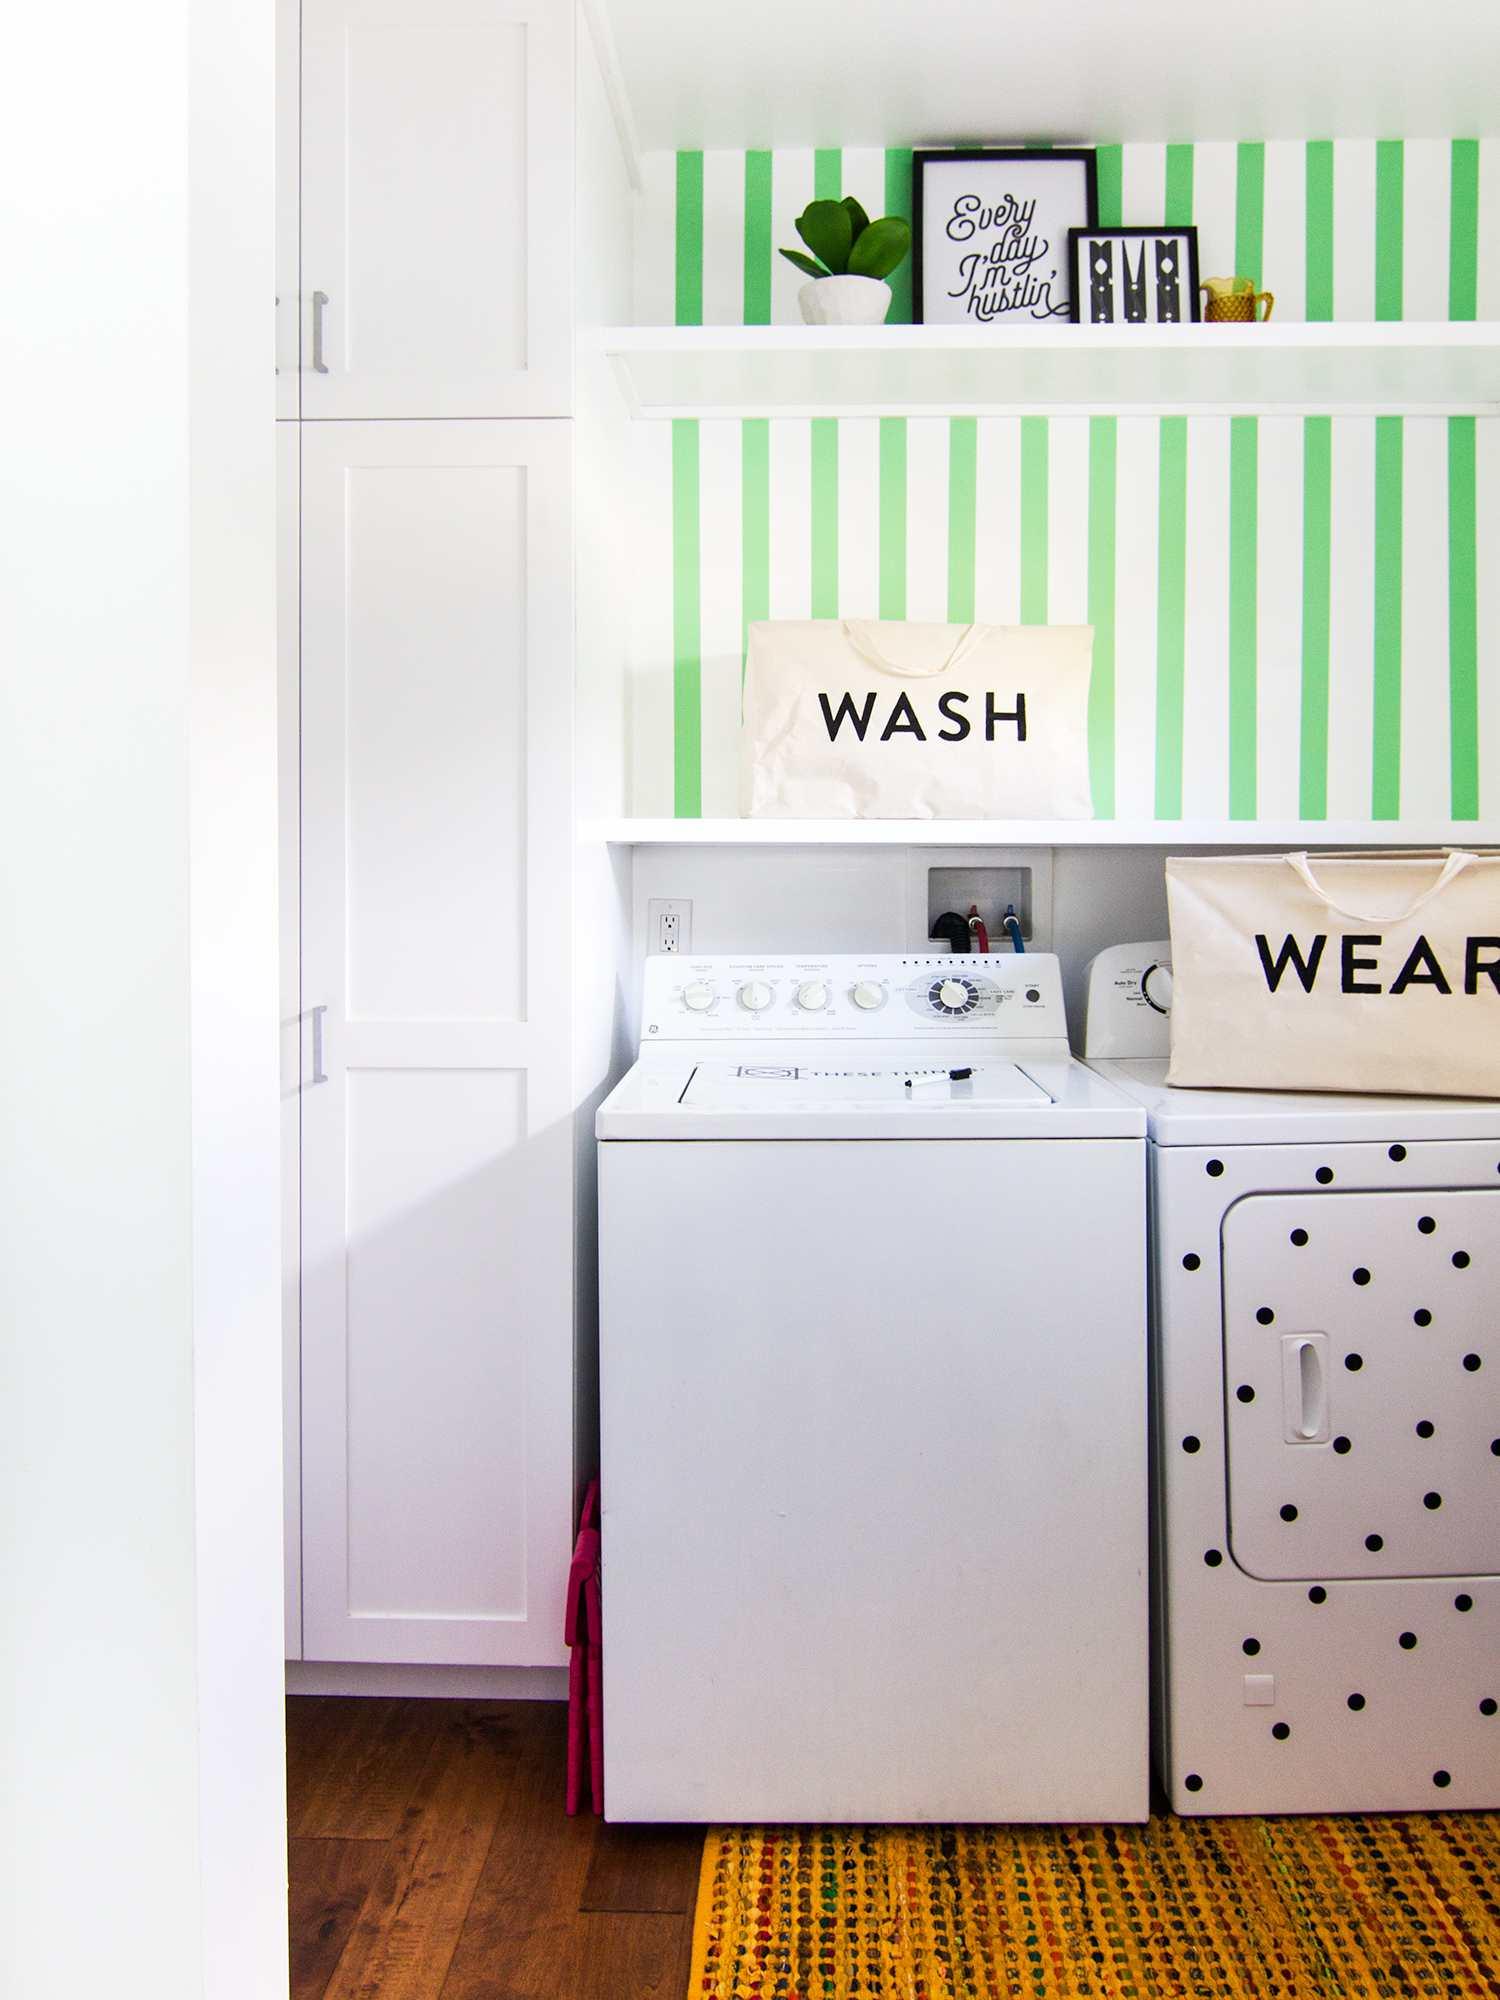 DIY Laundry Room Storage Baskets